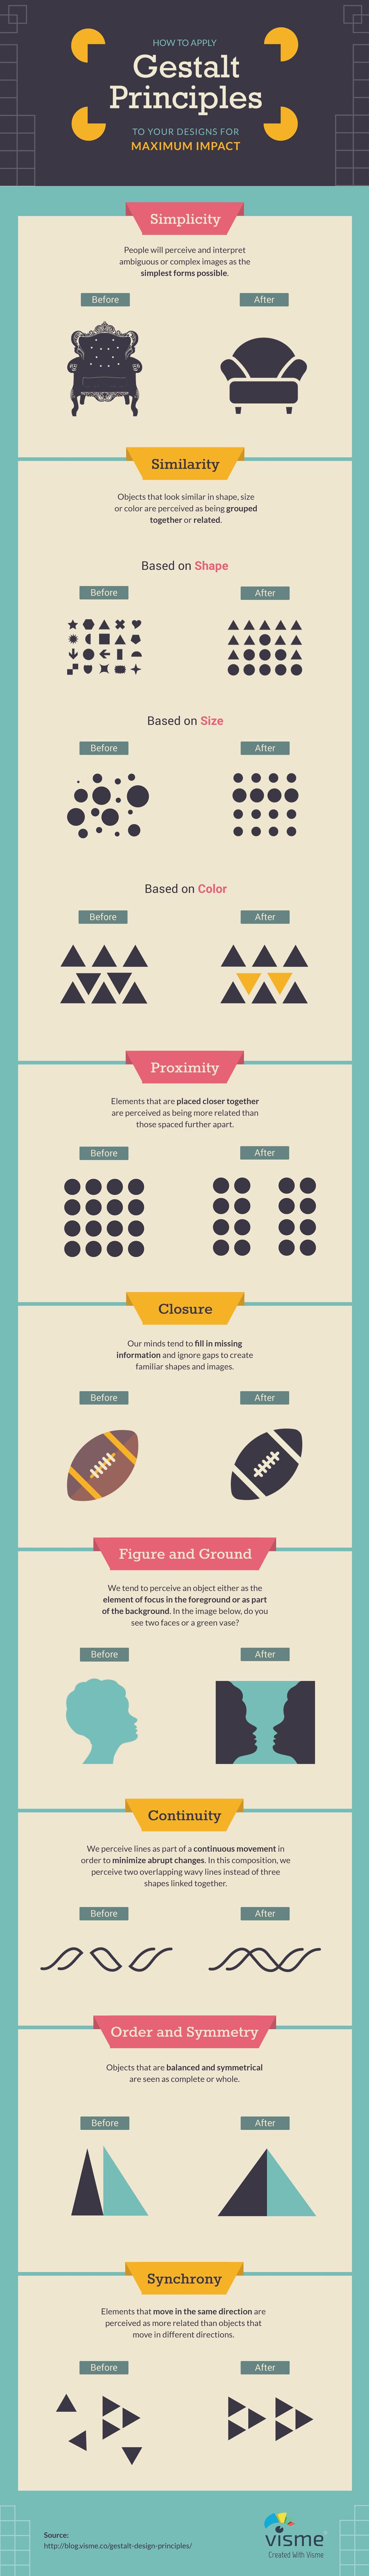 How-to-Apply-Gestalt-Principles-to-Your-Designs-for-Maximum-Impact-Infographic-gestalt design principles